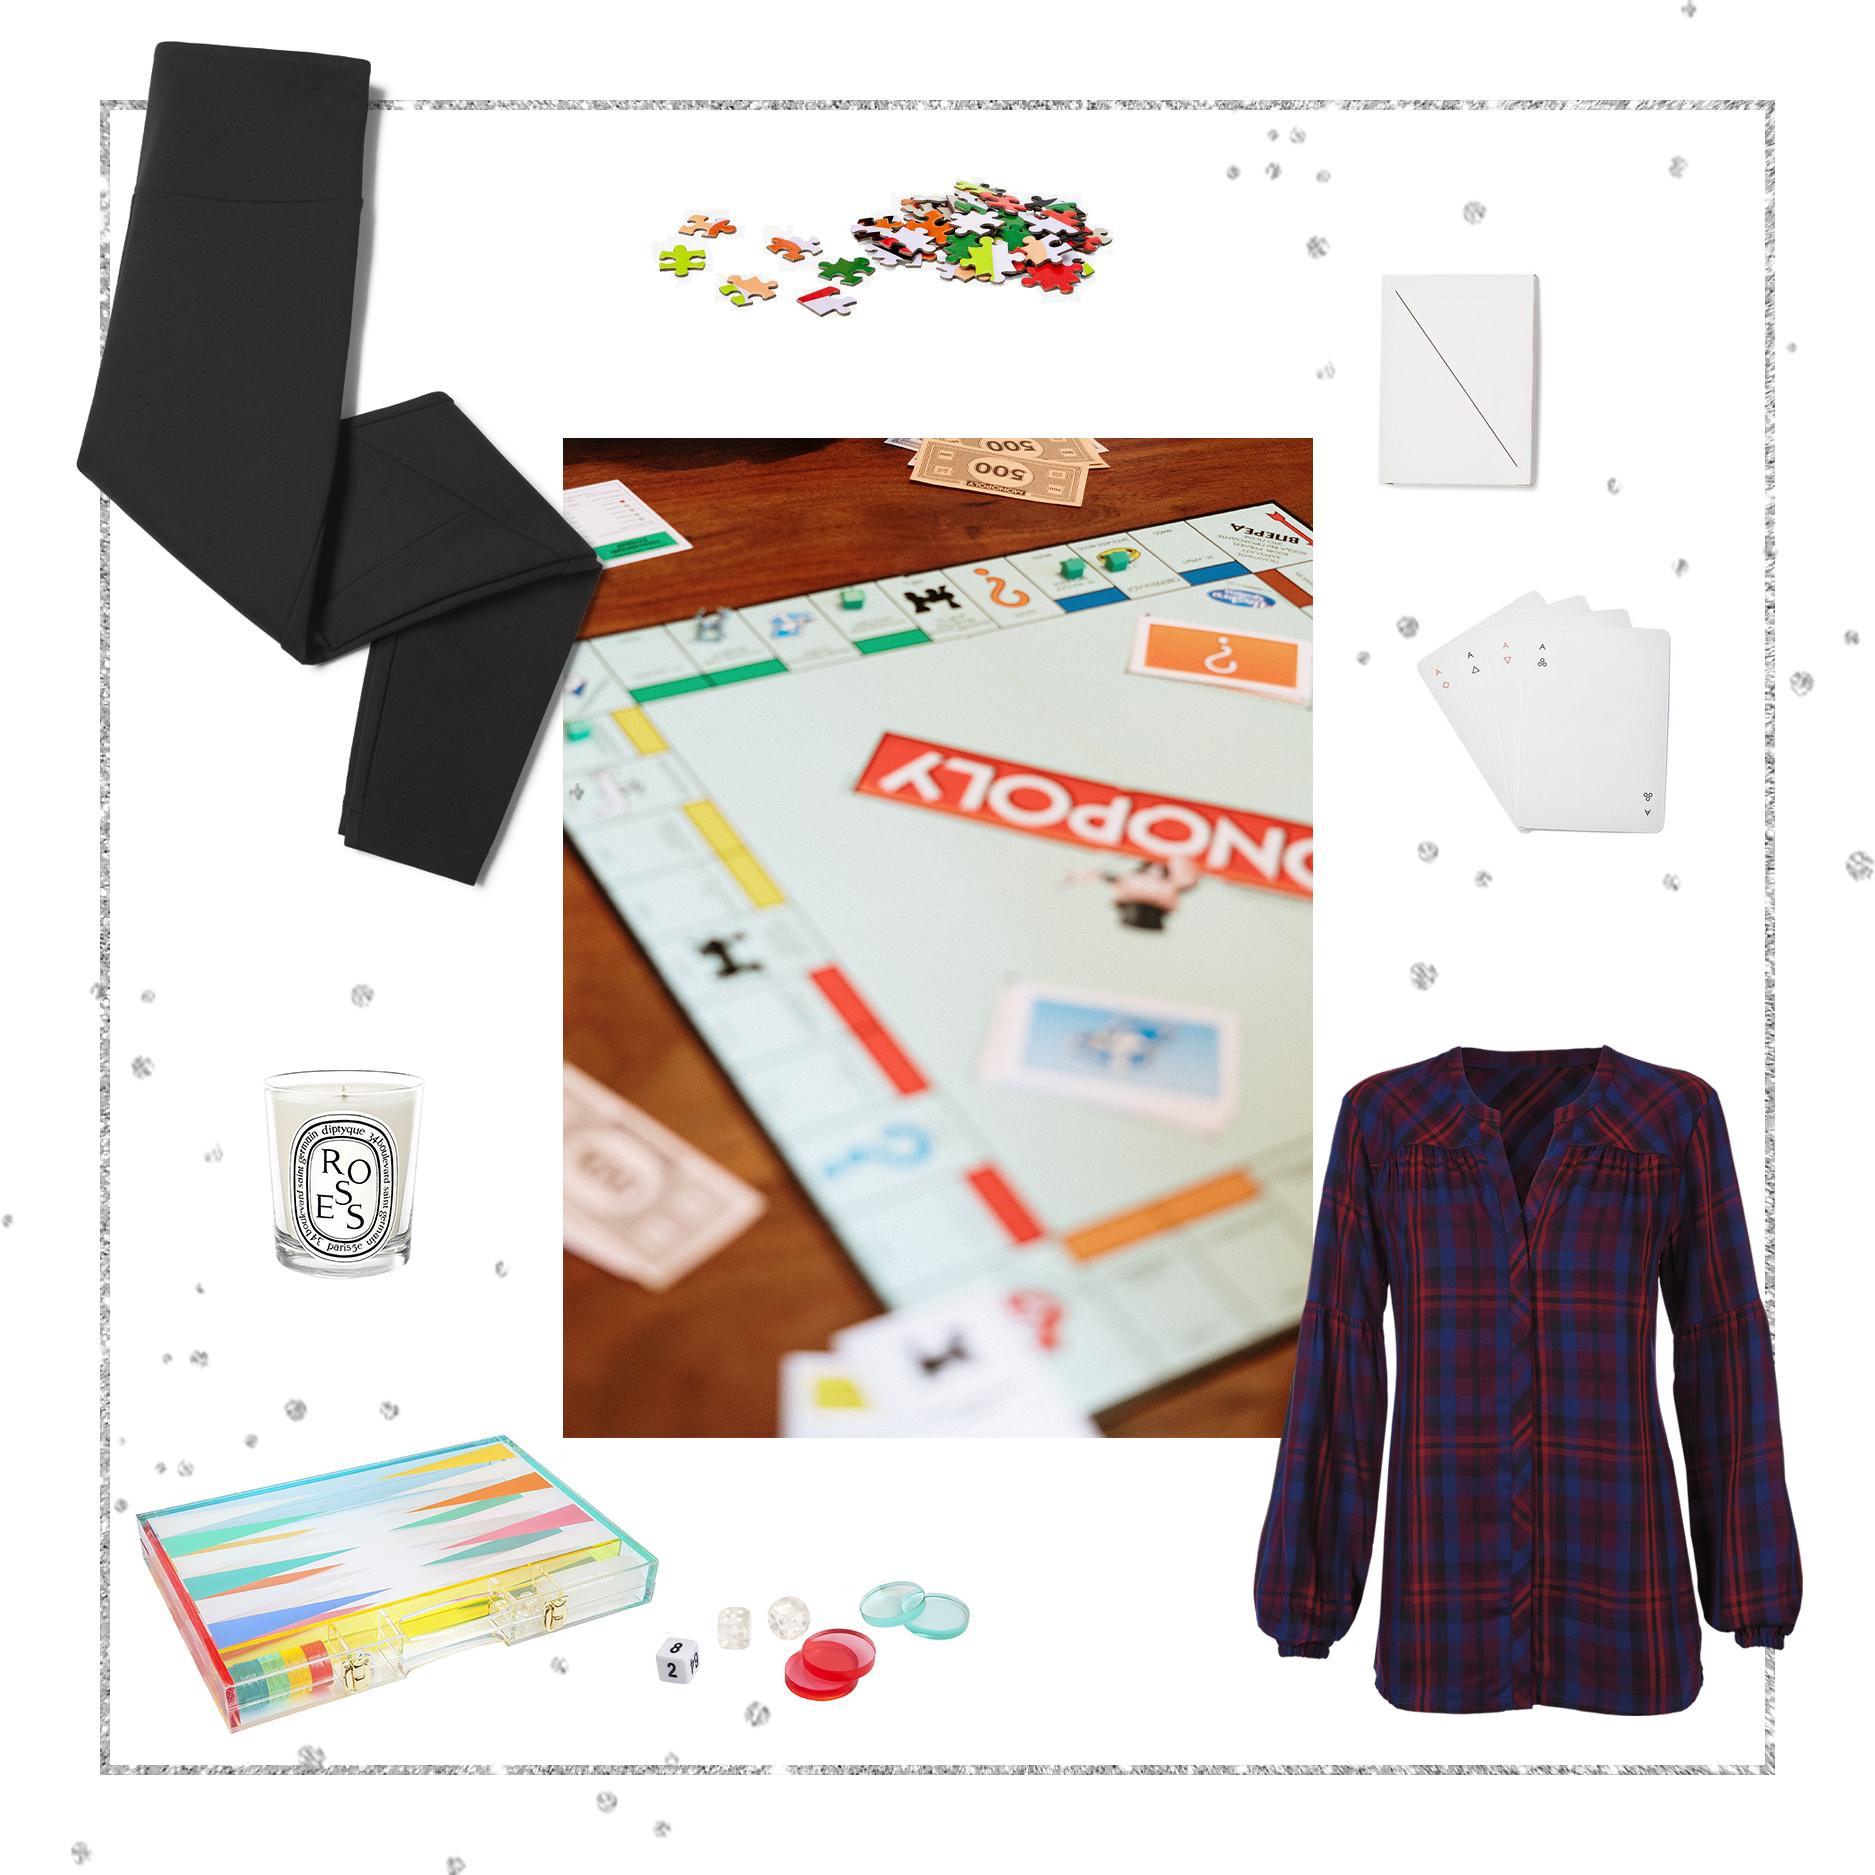 cabi Clothing | Fall 2020 | Winter Activity Ideas